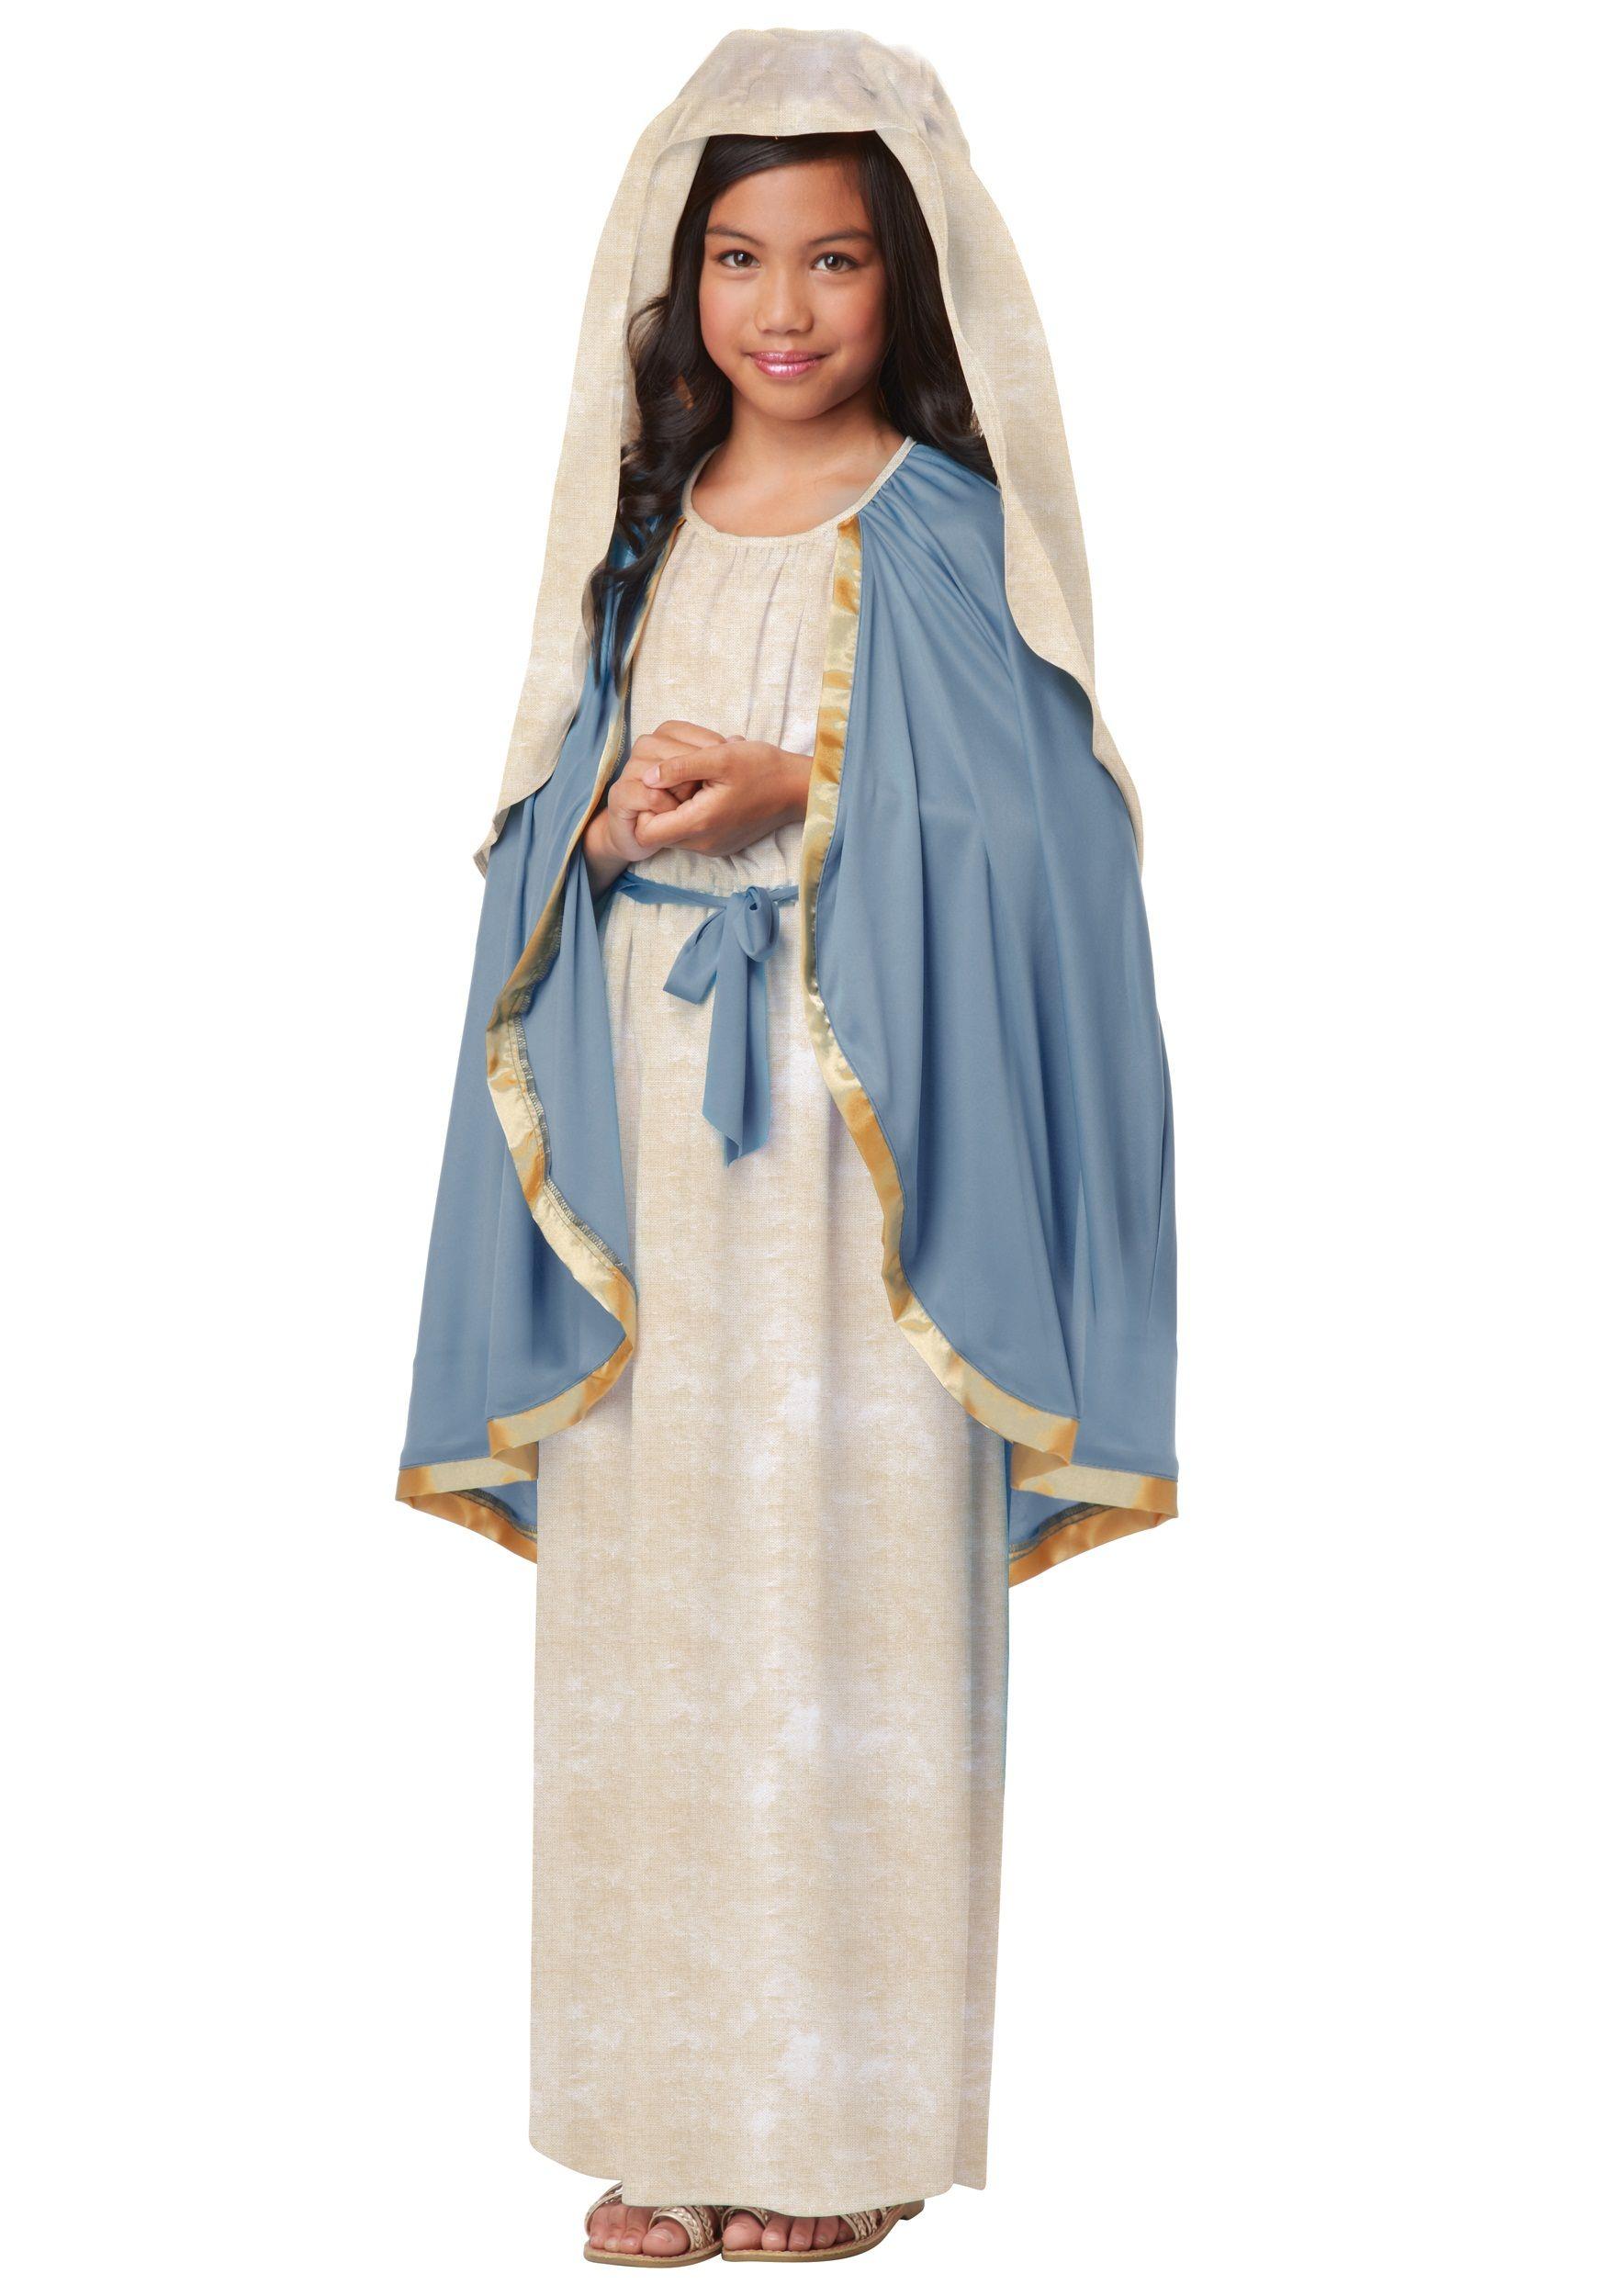 Girls Virgin Mary Costume  c4bc9ba1fbf8